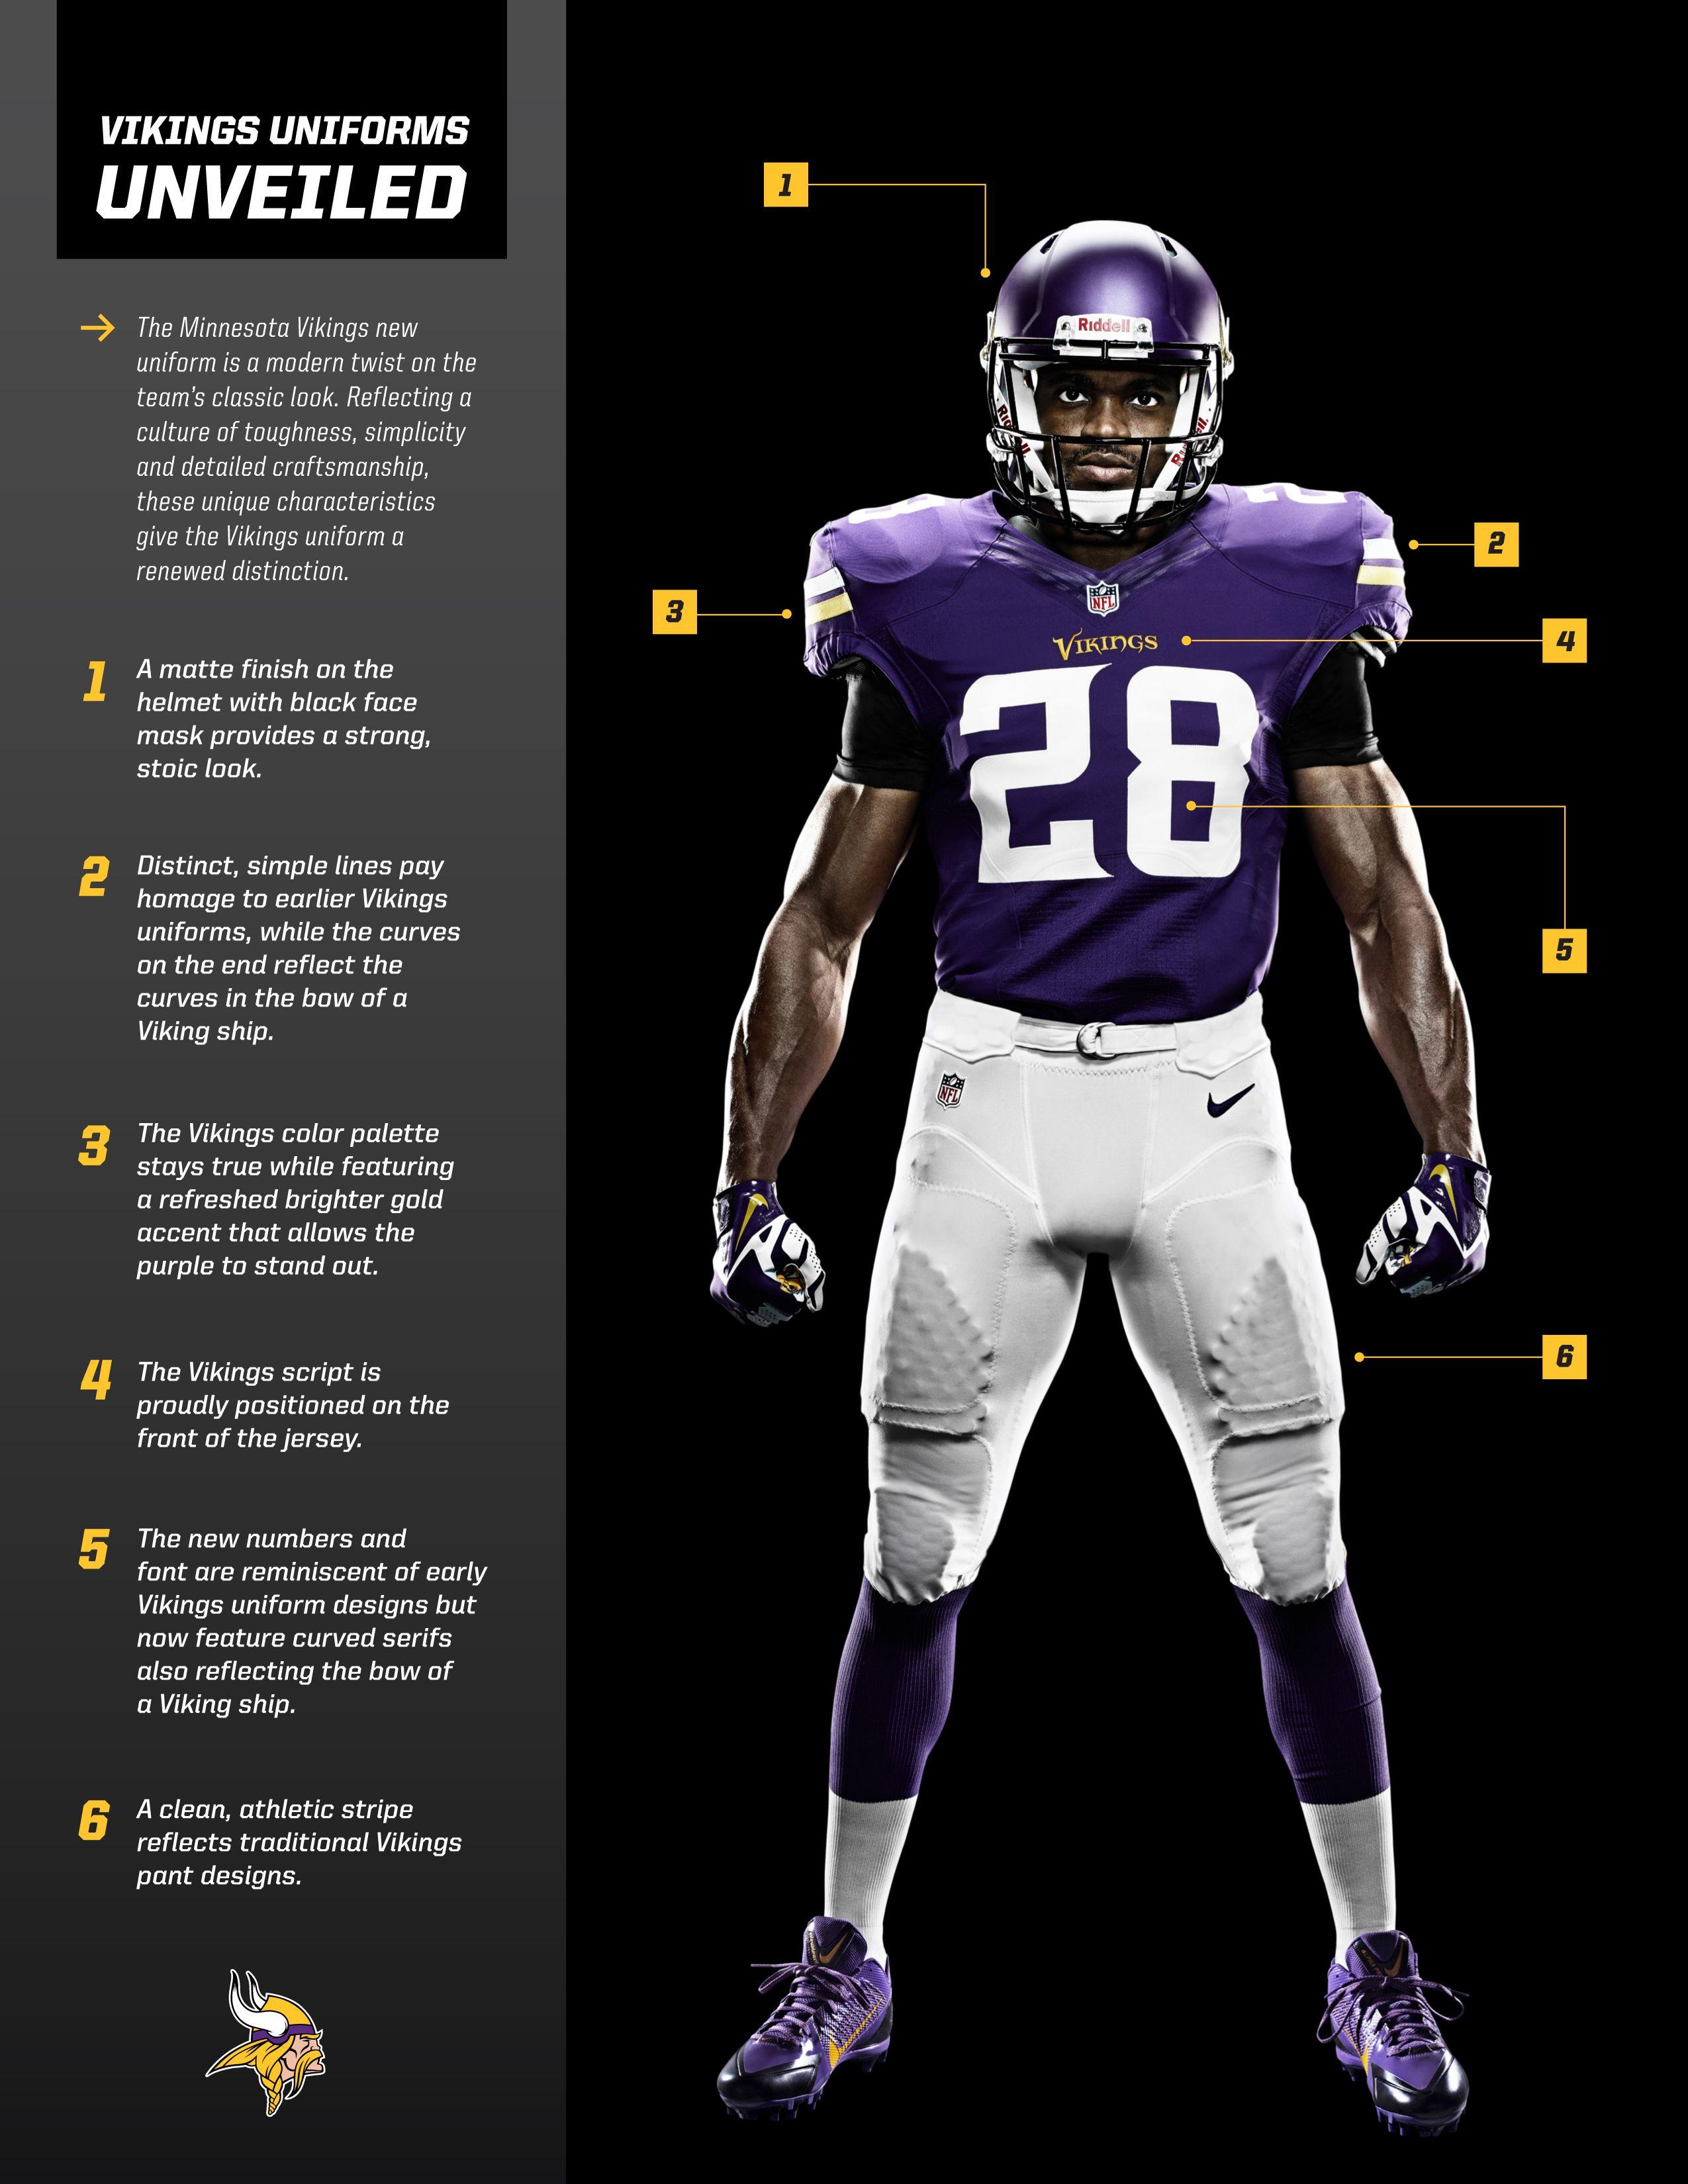 buy popular 0a7d4 389f4 new vikings uniforms - Google Search | Man Crush / AP/ MVP ...